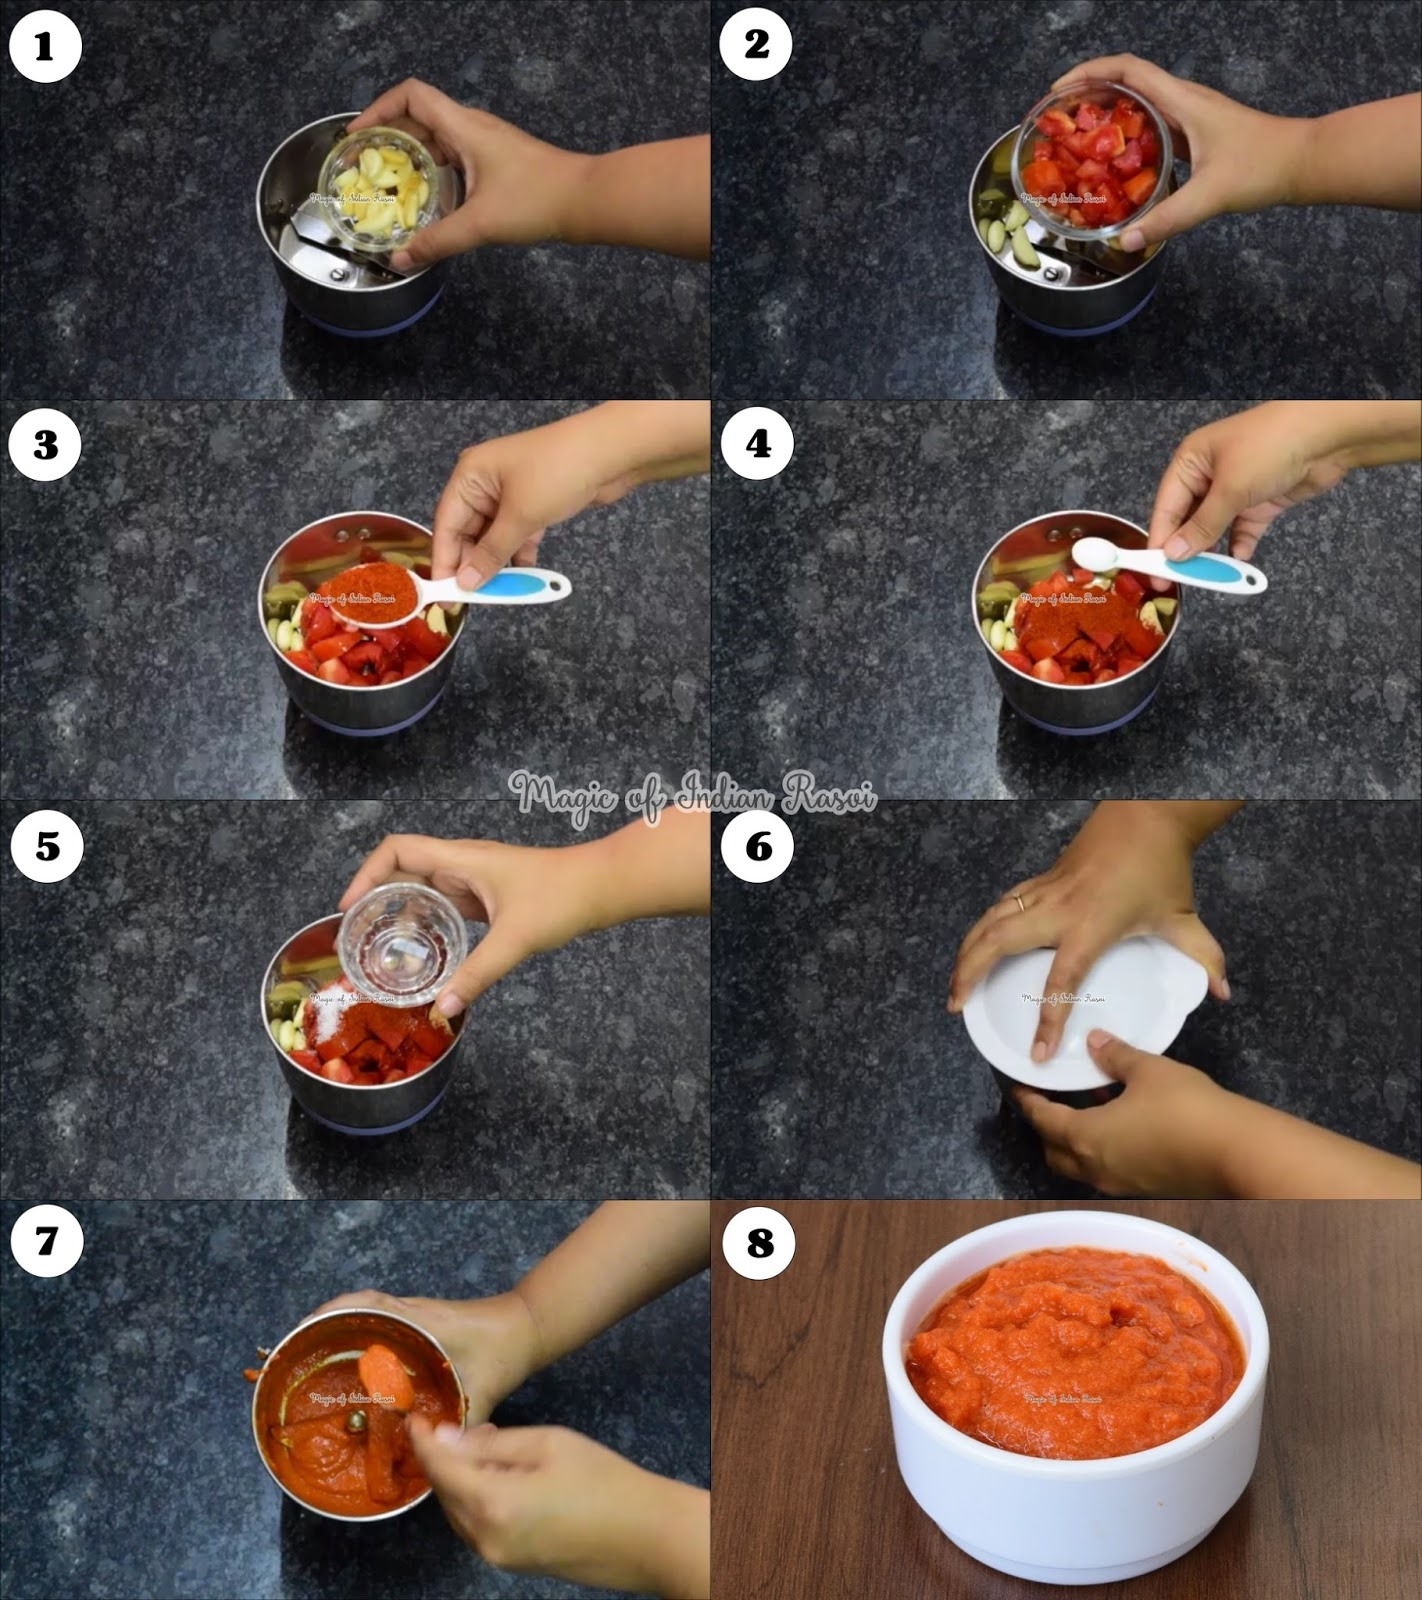 Garlic Chutney Recipe - Lahsun Chutney for Chaat - लहसुन चटनी रेसिपी - चाट के लिए लहसुन की चटनी - Priya R - Magic of Indian Rasoi